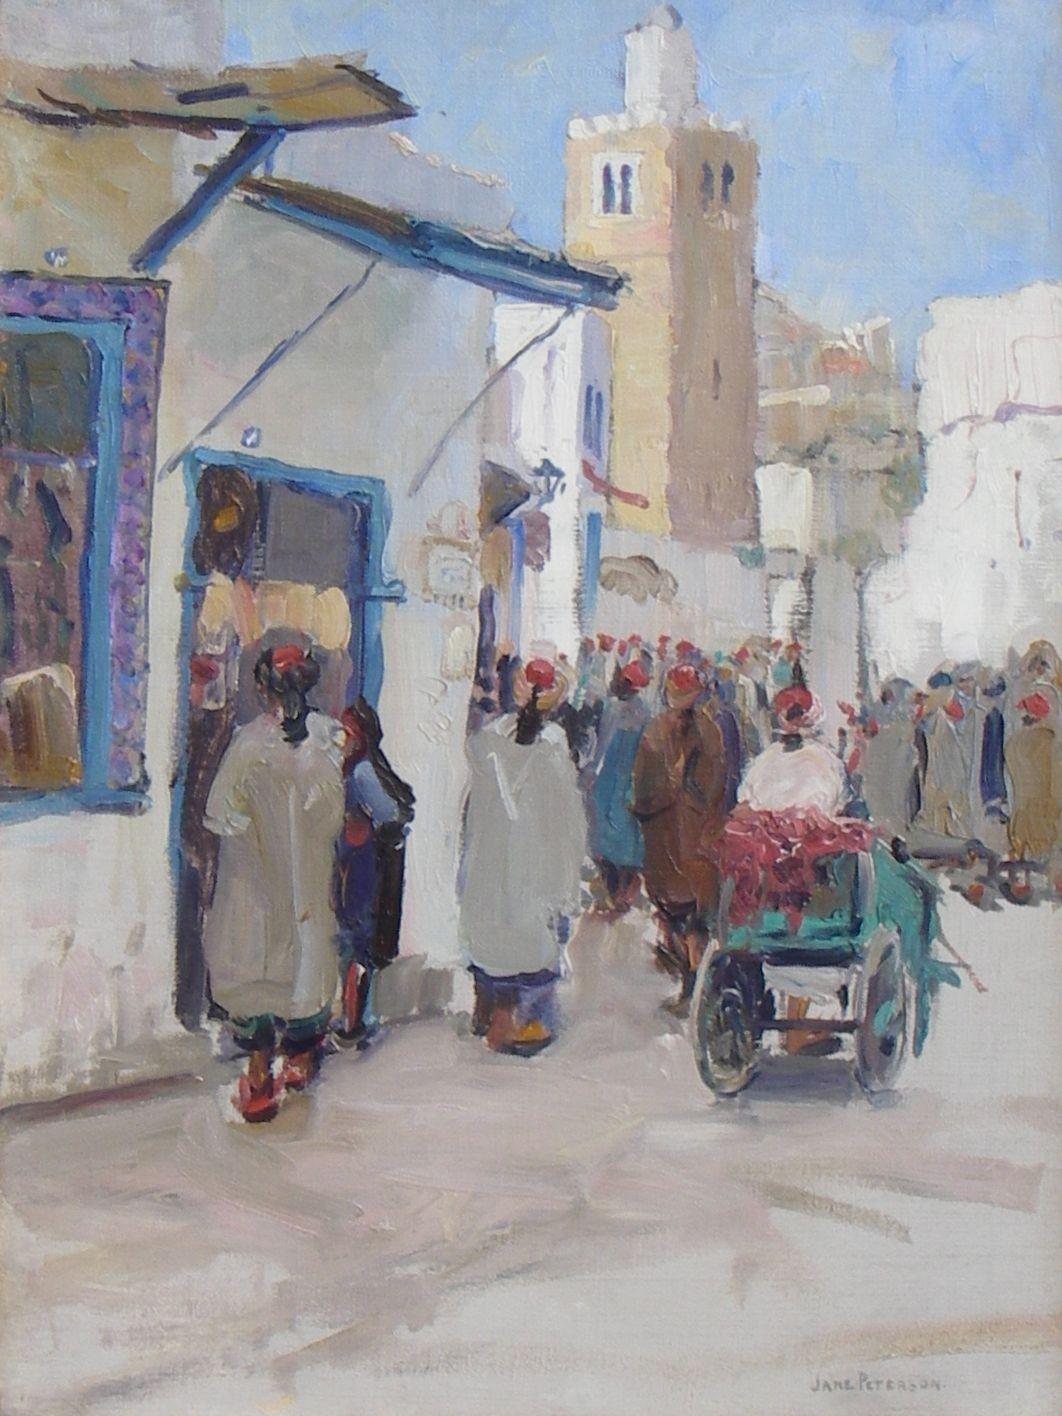 Jane Peterson, Street Scene Tunis